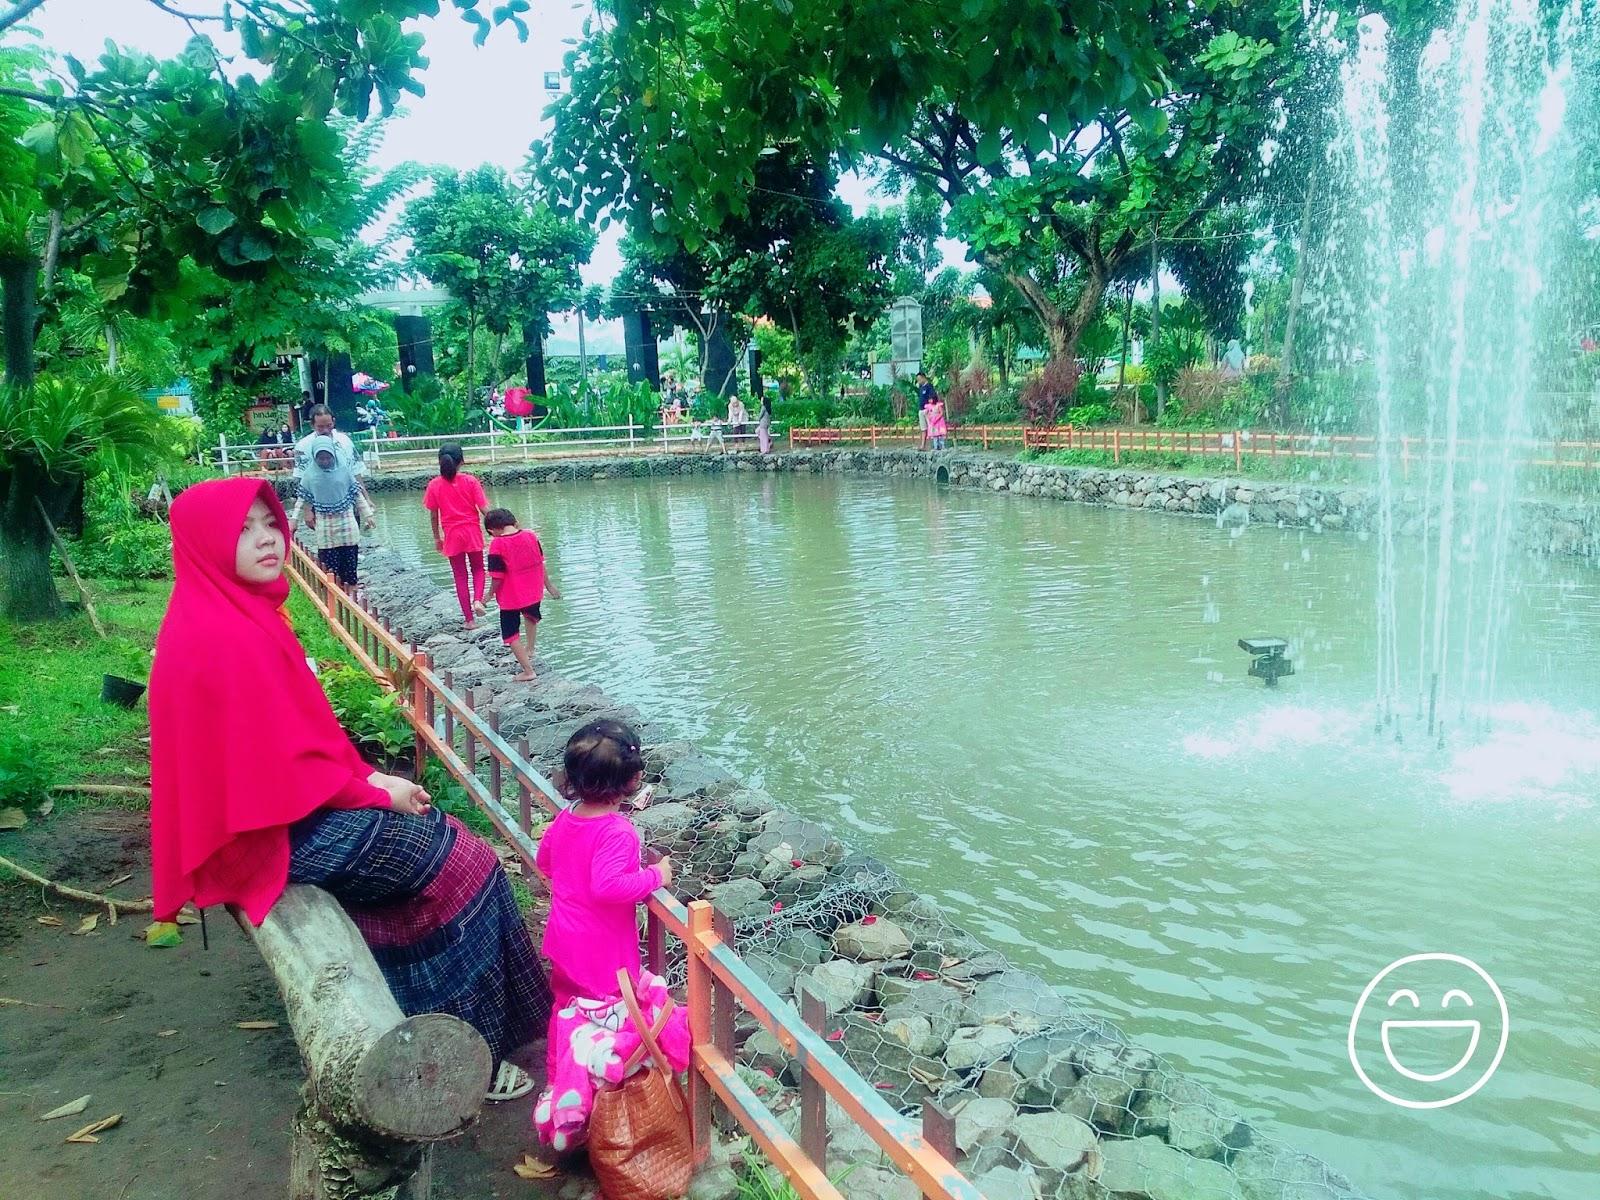 Wisata Keluarga Sidoarjo Taman Abhirama Haya Zone Duduk Santai Menikmati